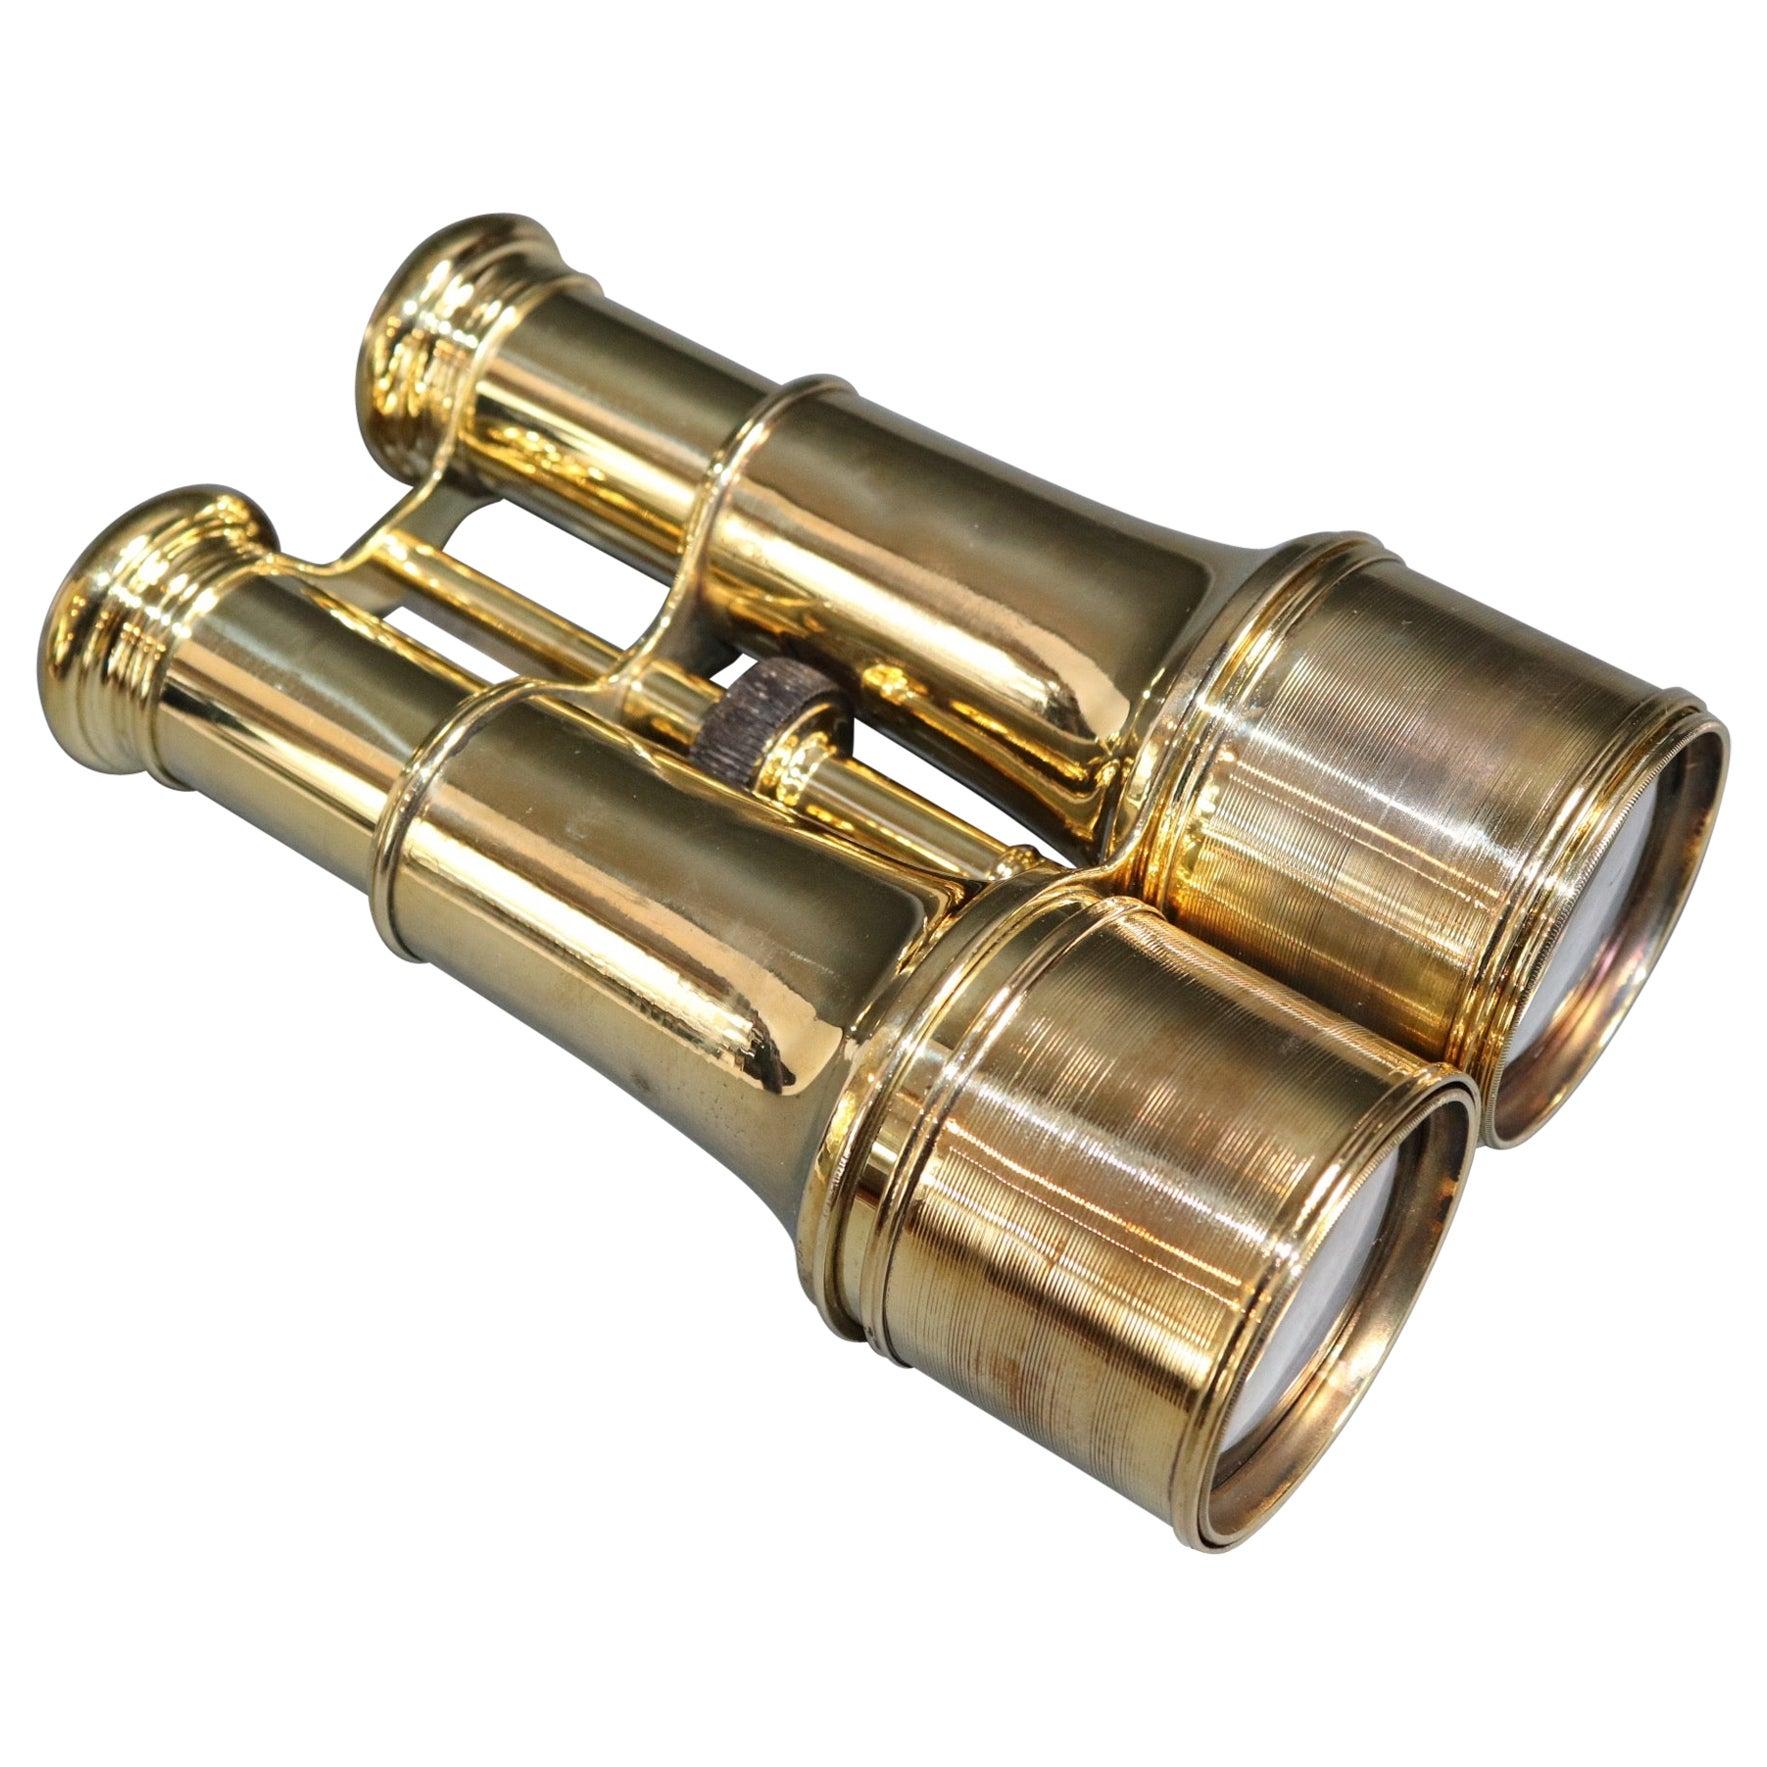 French Made Brass Yachting Binoculars